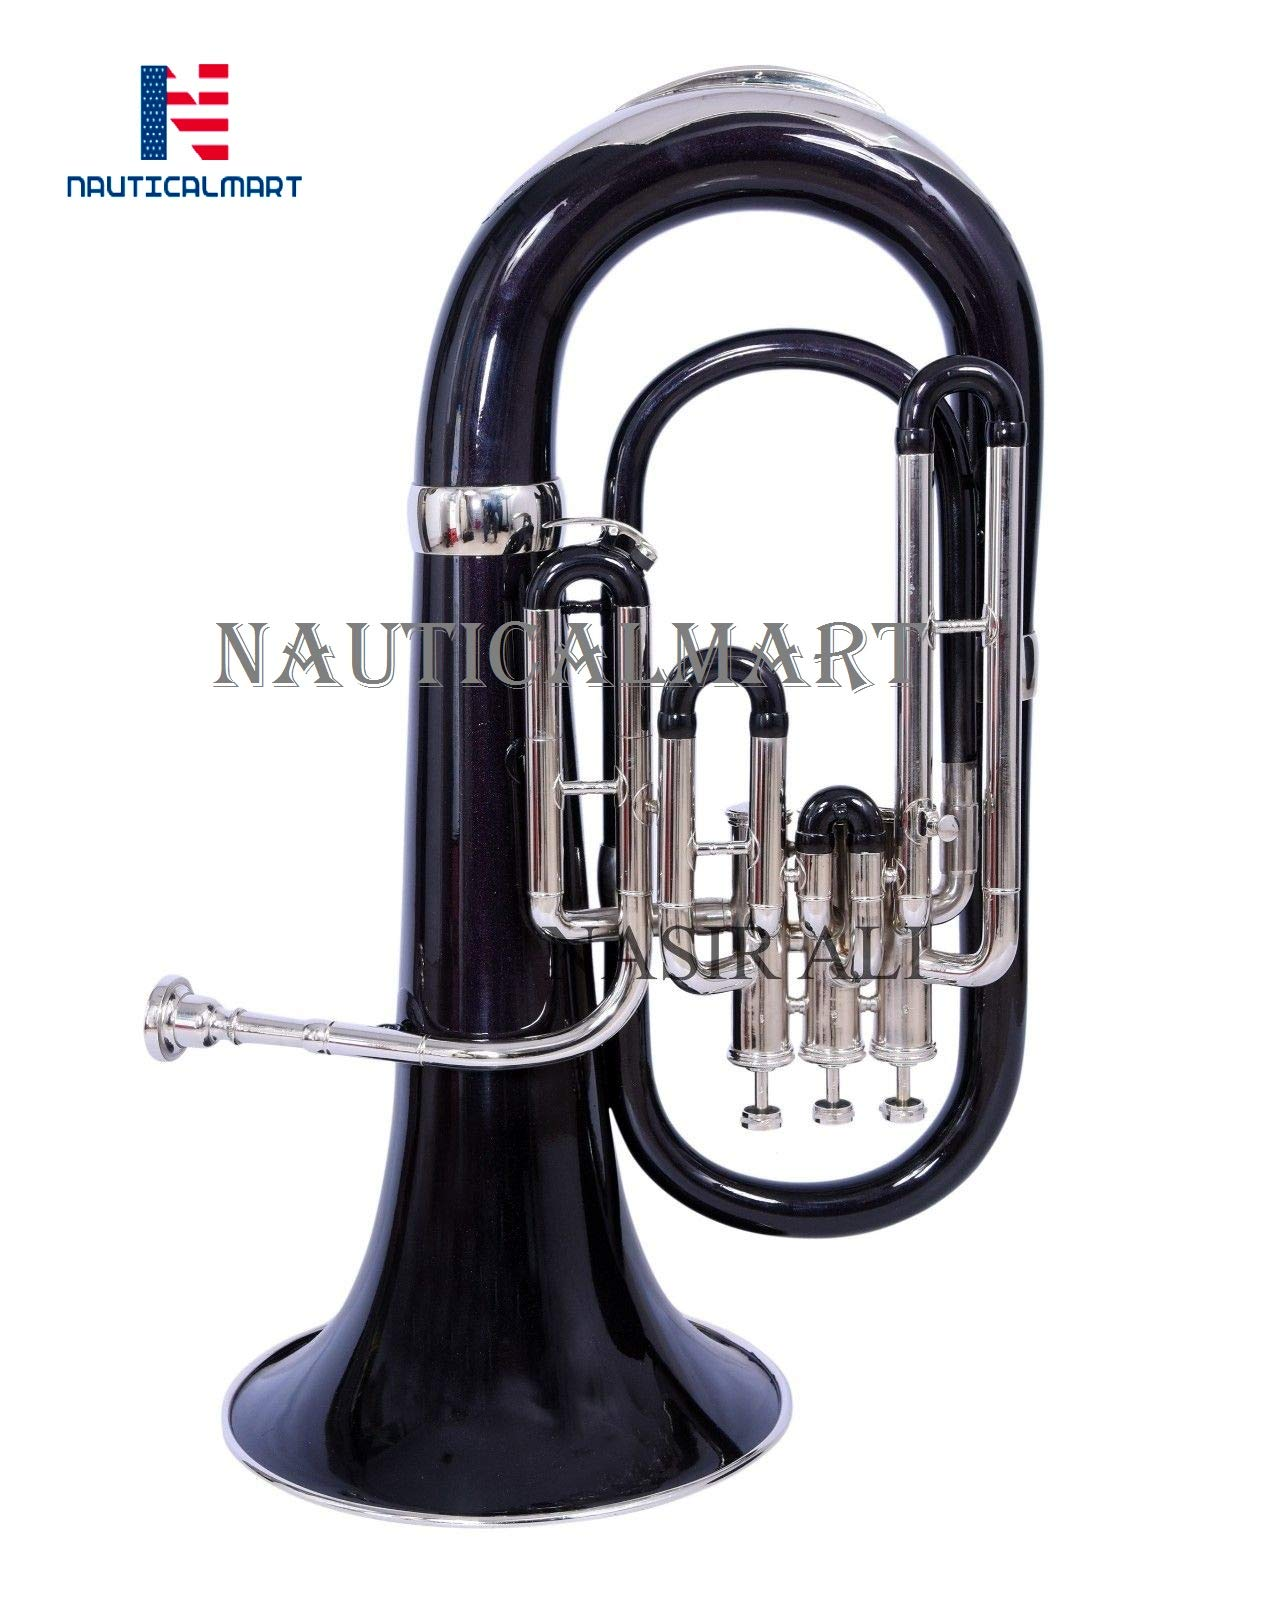 NauticalMart Nickel Bb Euphonium 3 Valve - Black Shade